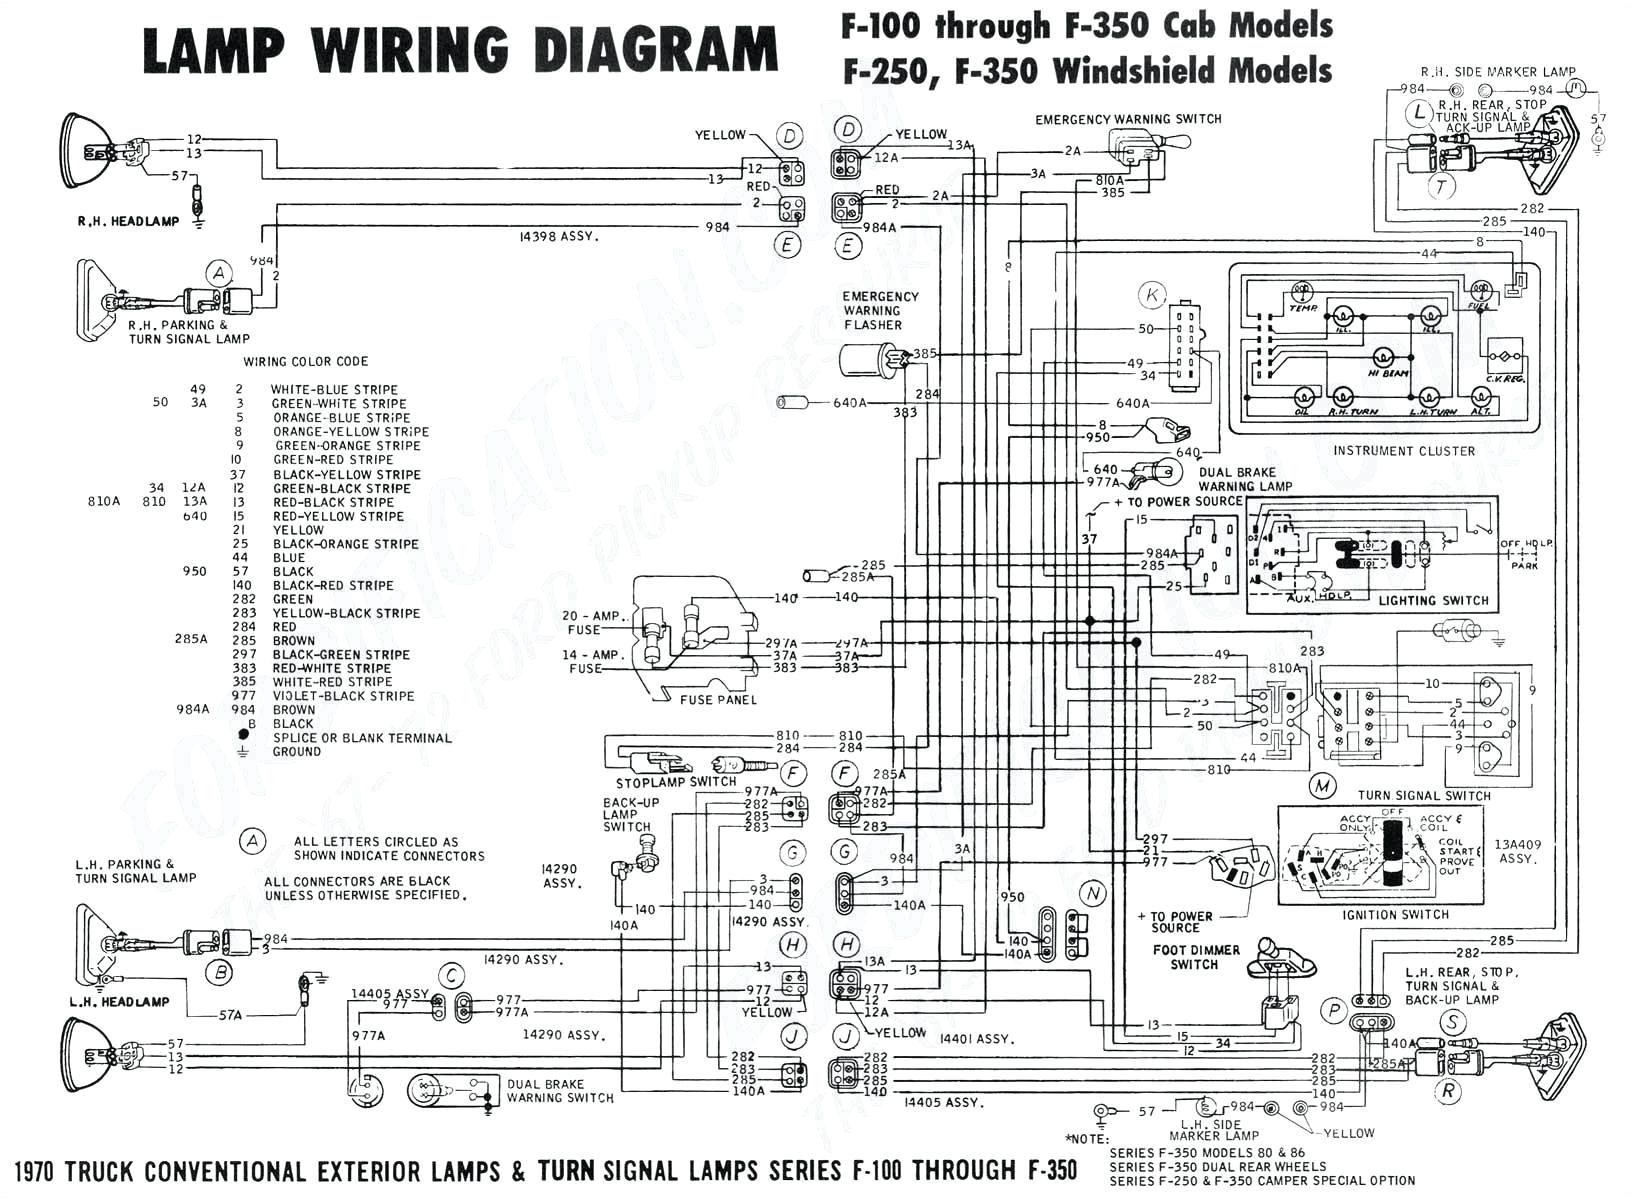 ford freestyle trailer wiring wiring diagram expert ford freestar wiring harness wiring diagram blog ford freestar